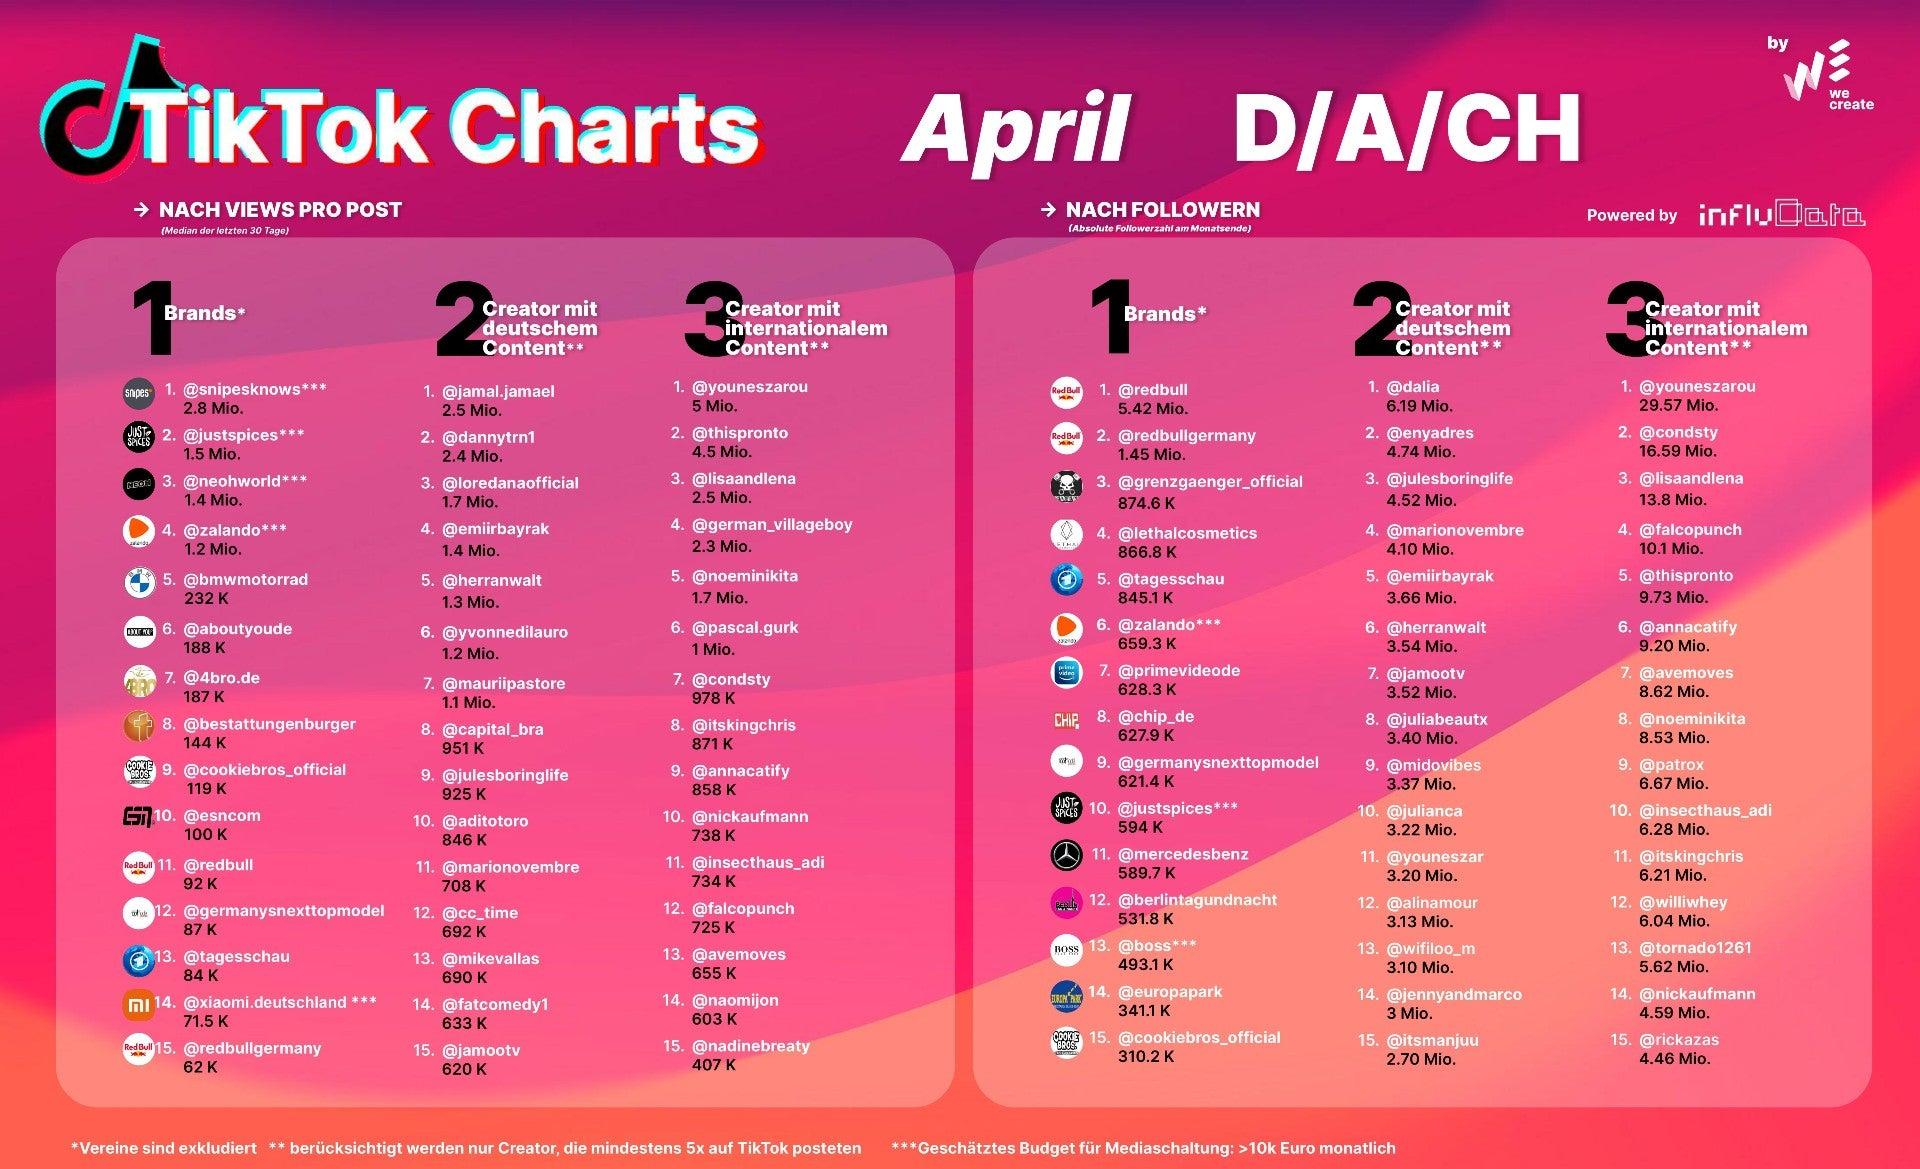 Tiktok-Ranking April 2021